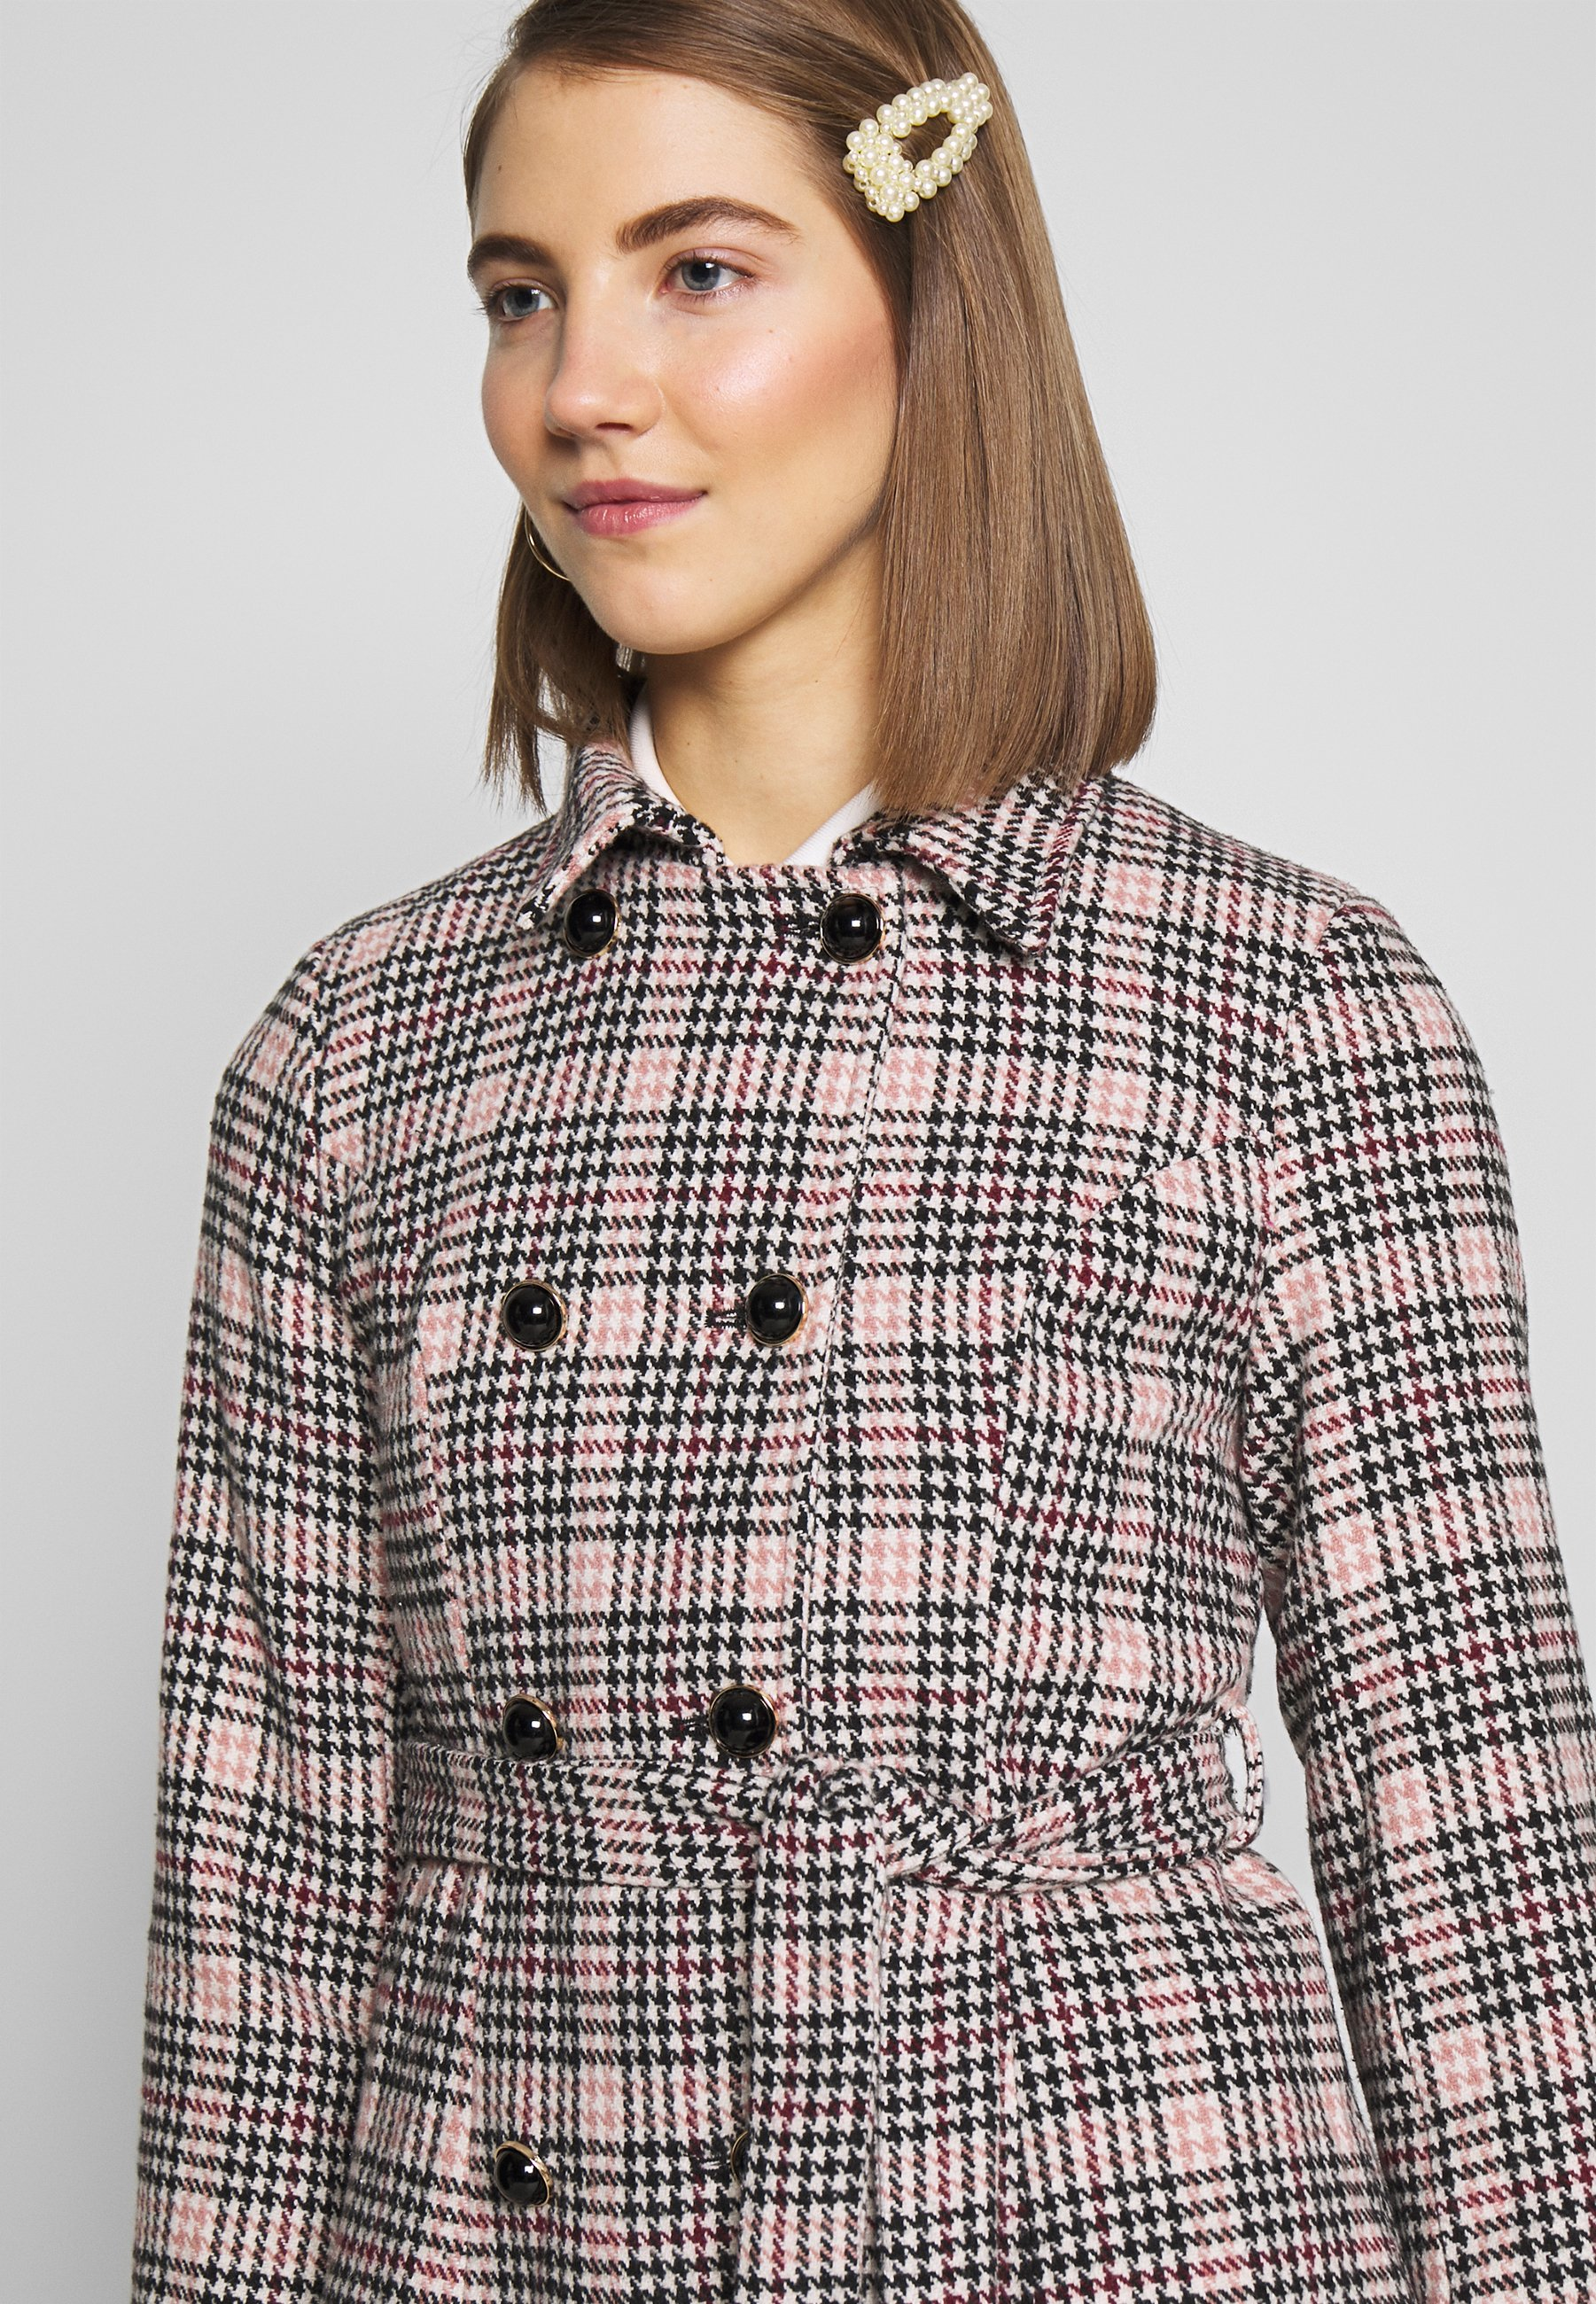 Fashion Union Model - Blazer Light Pink